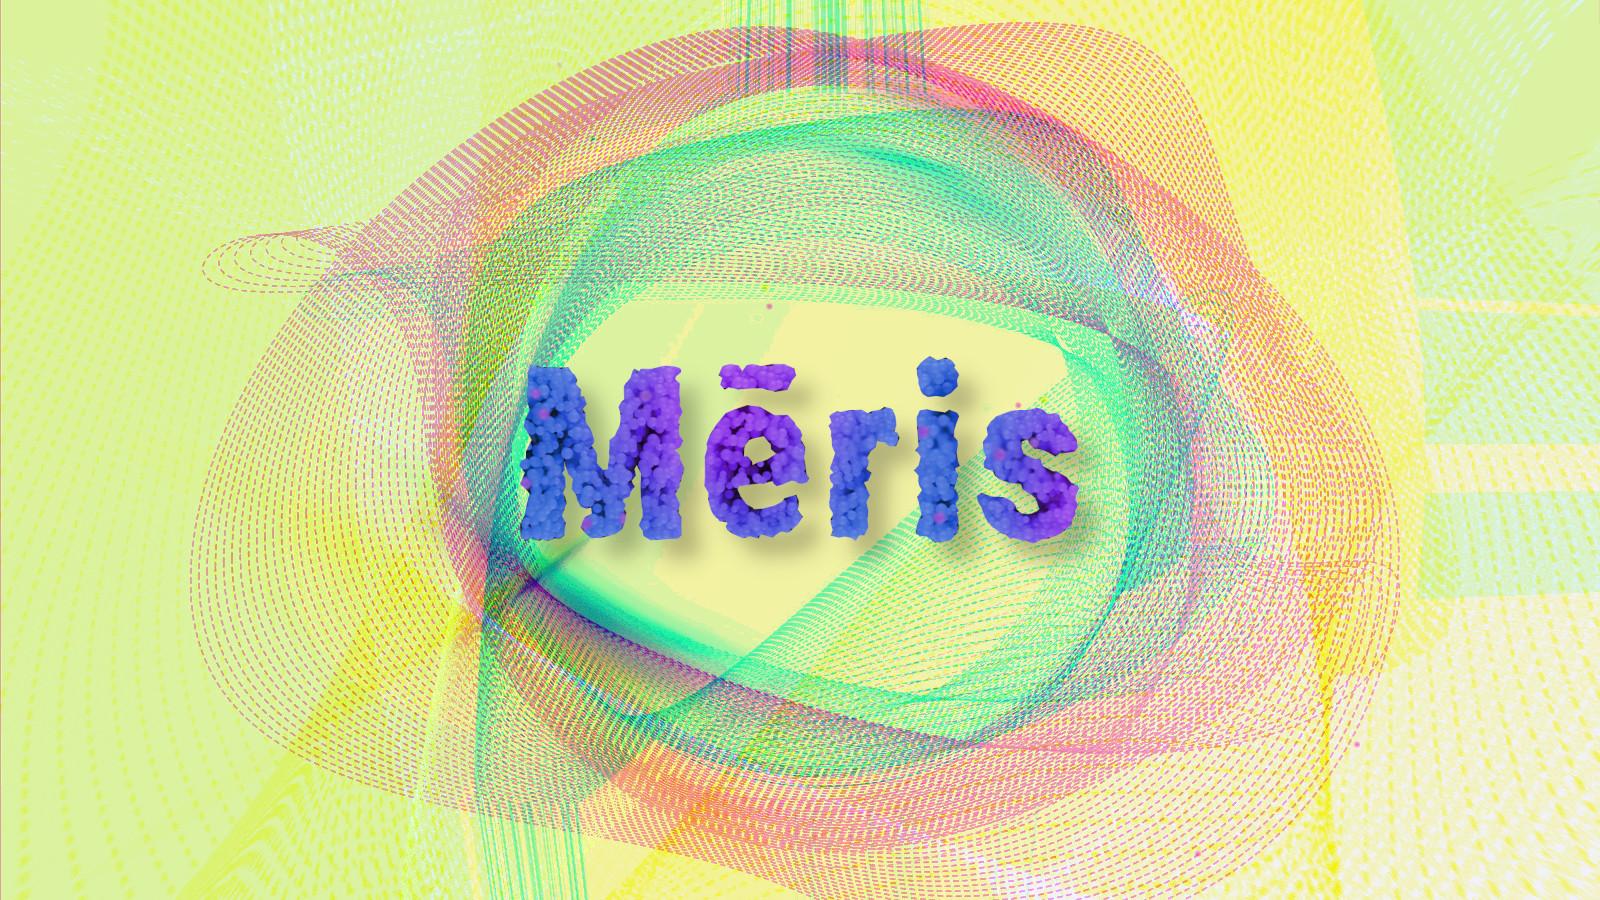 New Mēris botnet breaks DDoS record with 21.8 million RPS attack